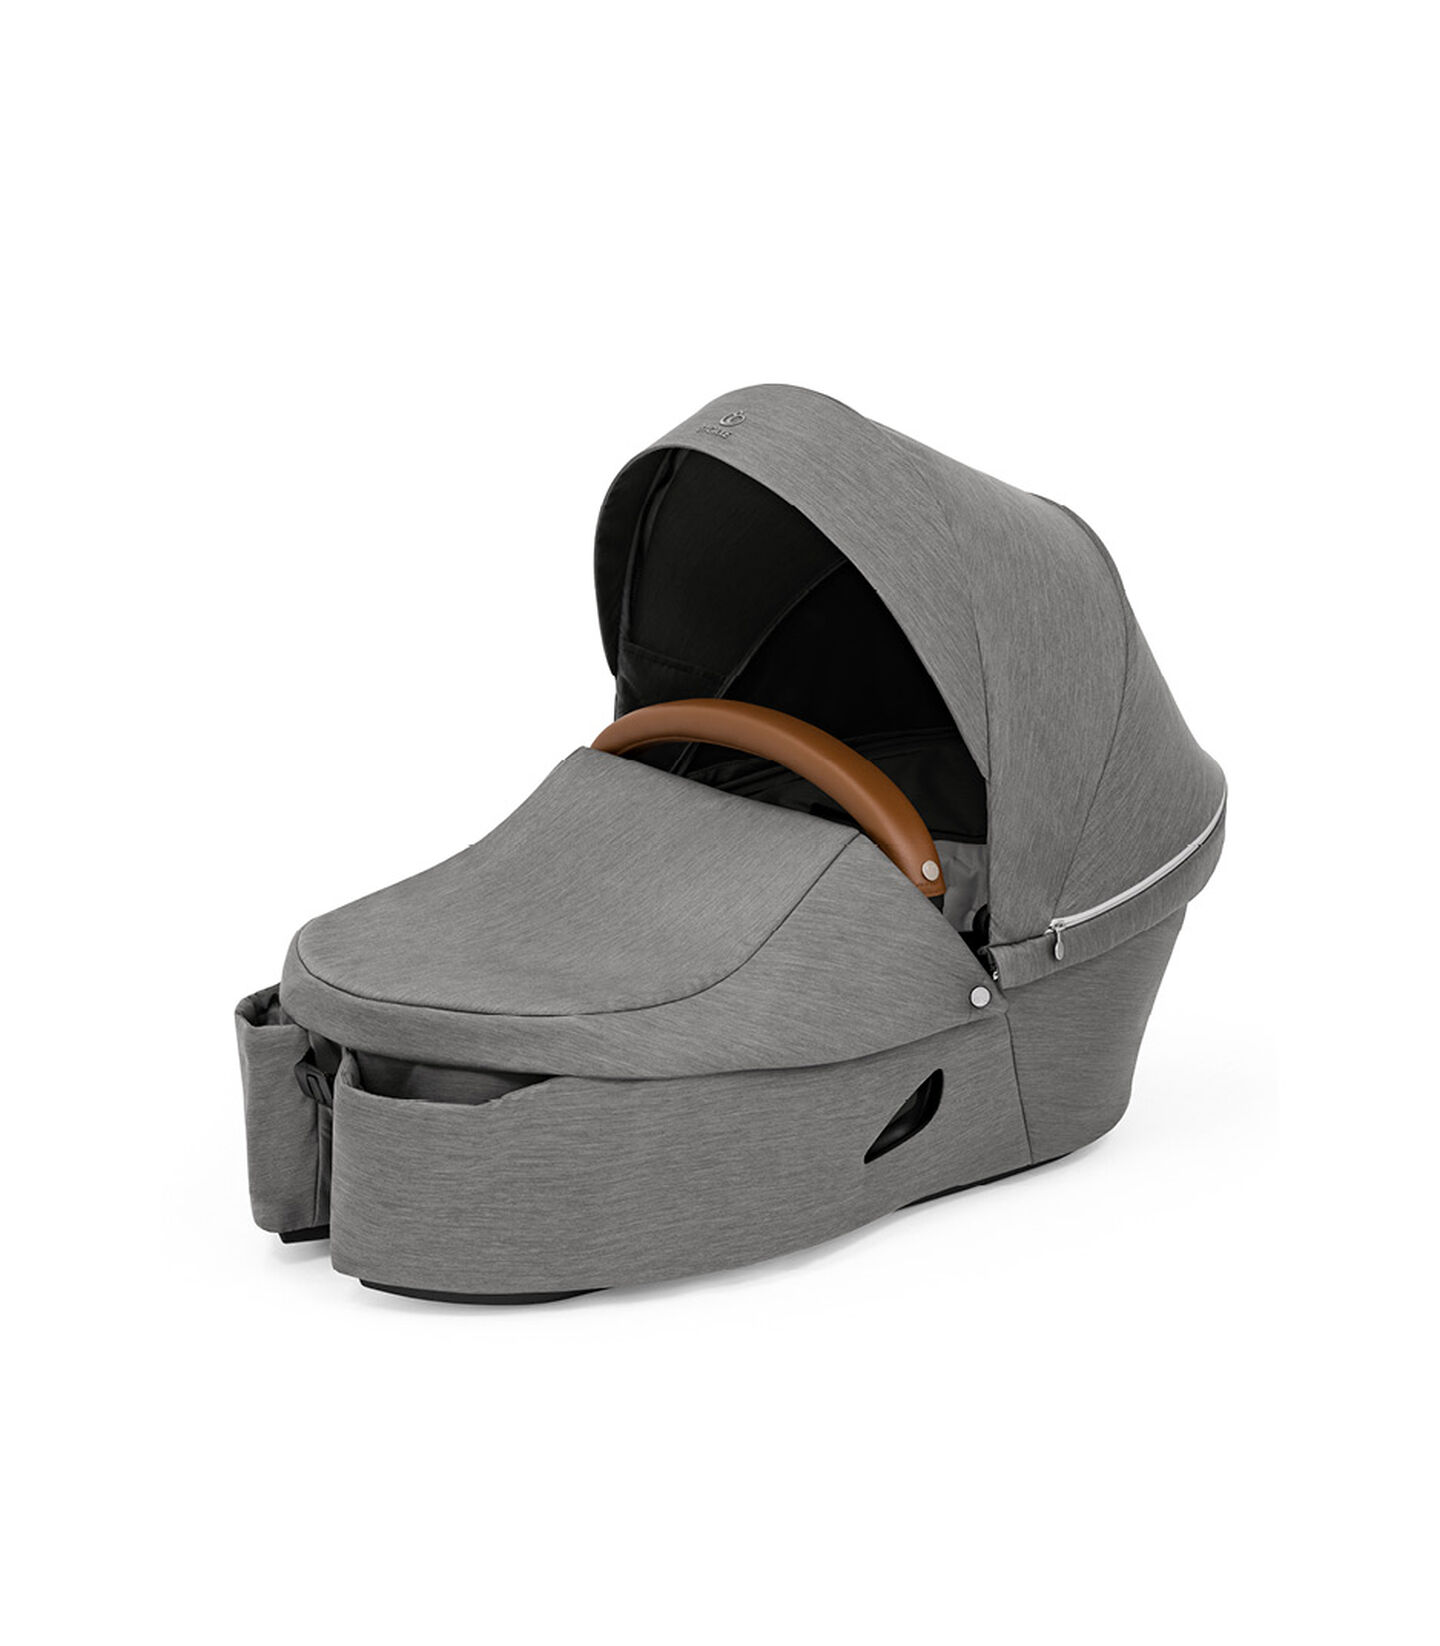 Stokke® Xplory® X Babyschale Modern Grey, Modern Grey, mainview view 6